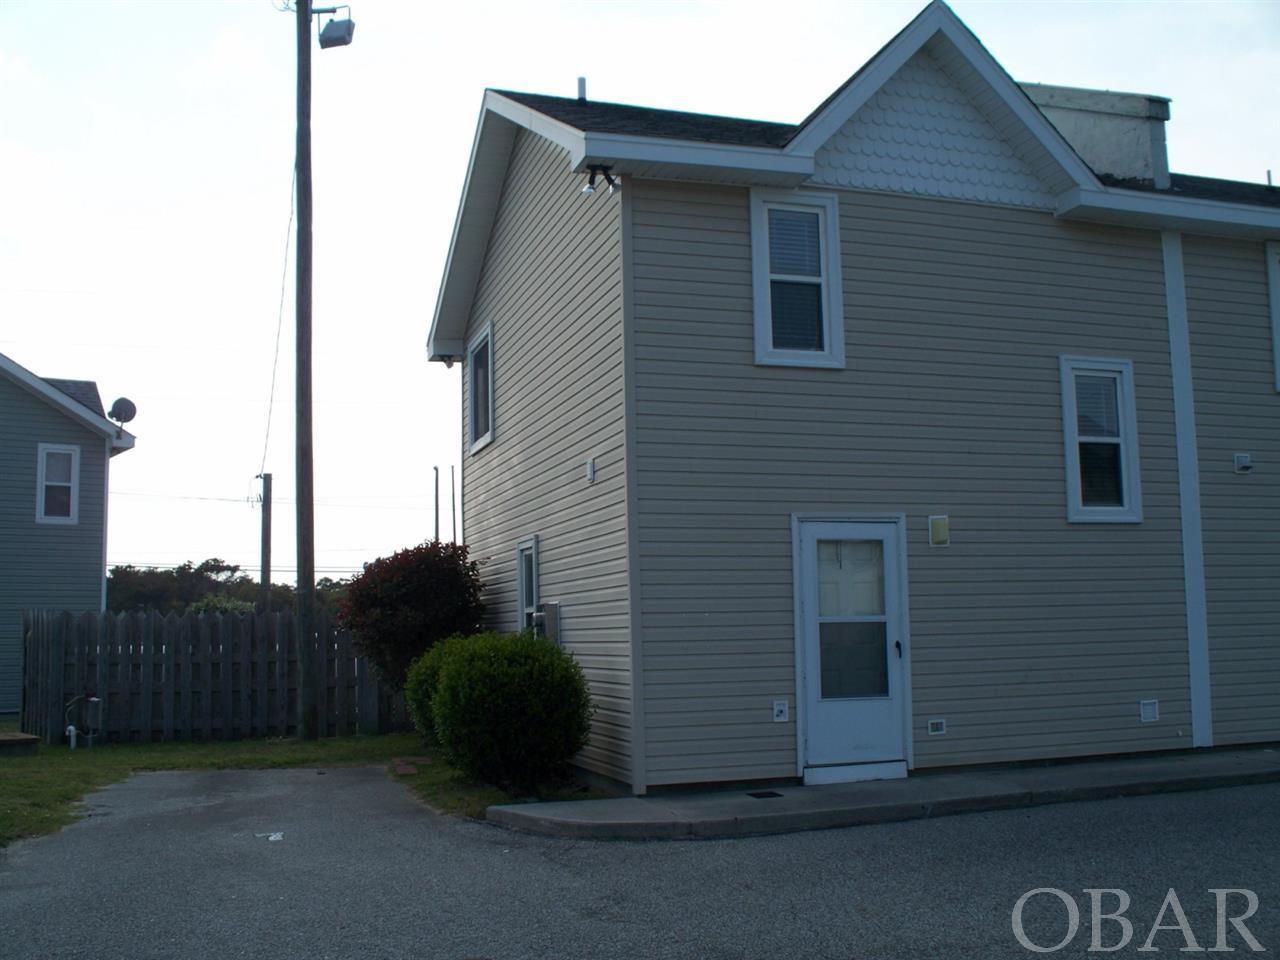 1200-7 Wrightsville Boulevard Lot 7, Kill Devil Hills, NC 27948